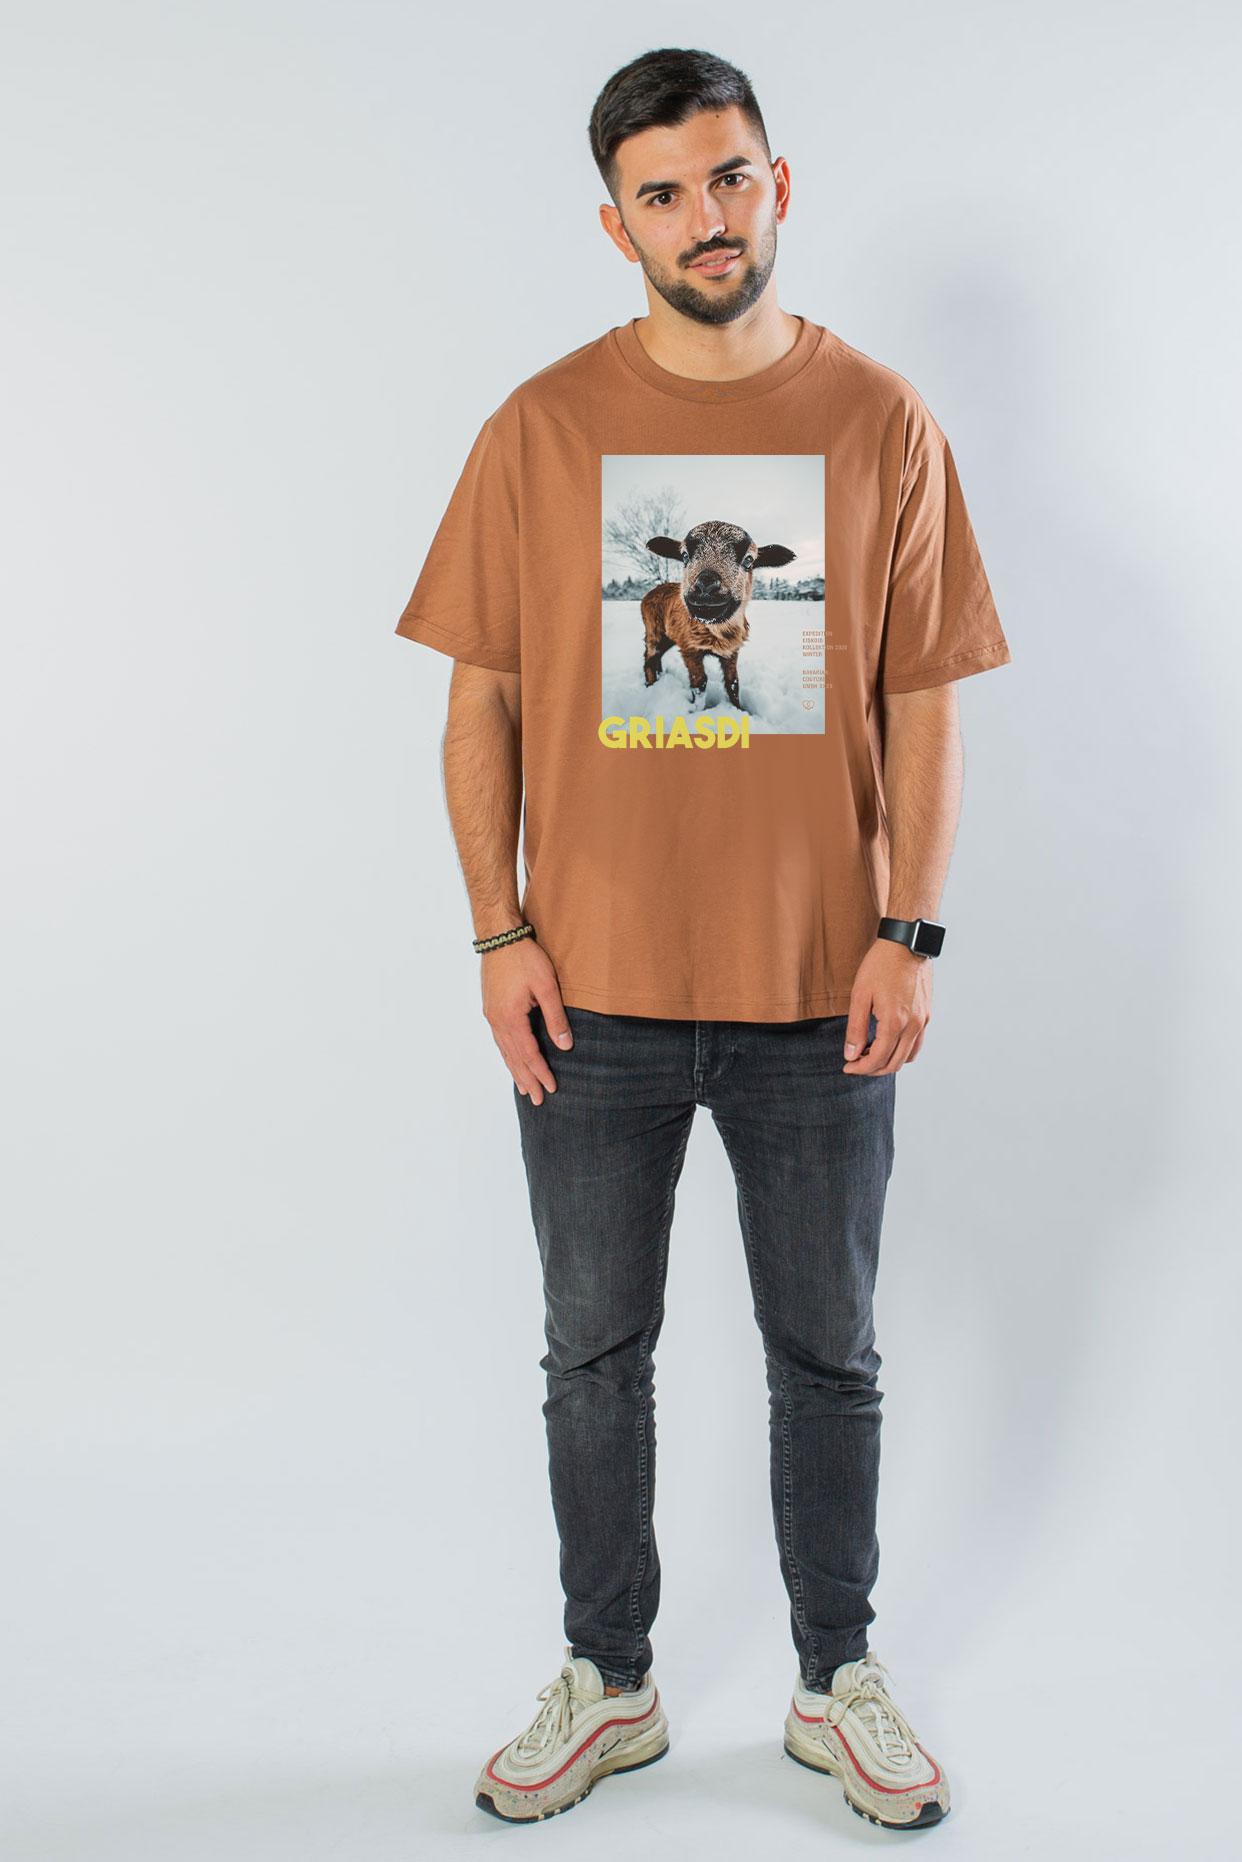 Griasdi Unisex T-Shirt